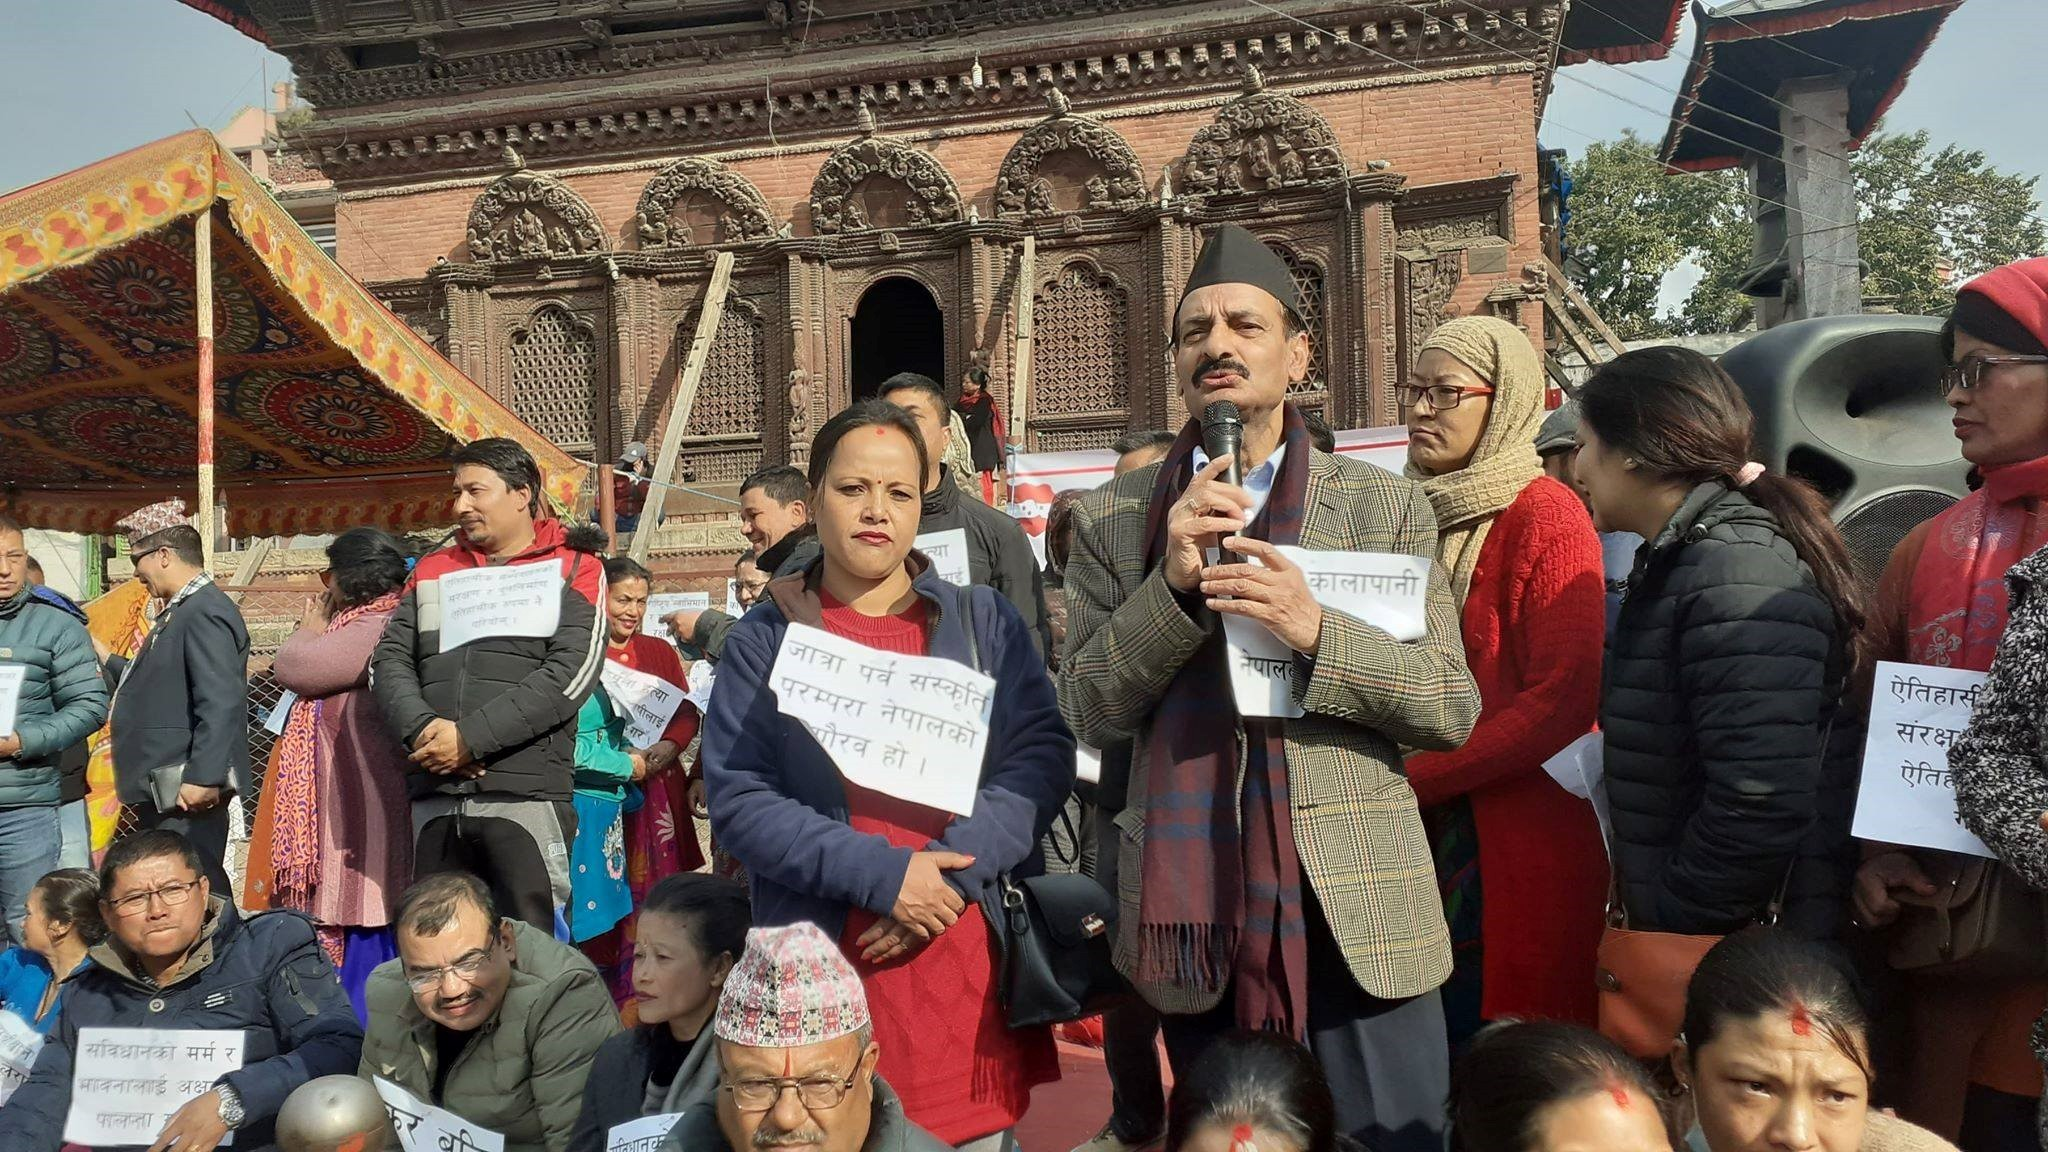 सरकार नसच्चिए दुईतिहाई ढाल्न काठमाडौंका जनता सडकमा आउने जोशीको चेनावनी